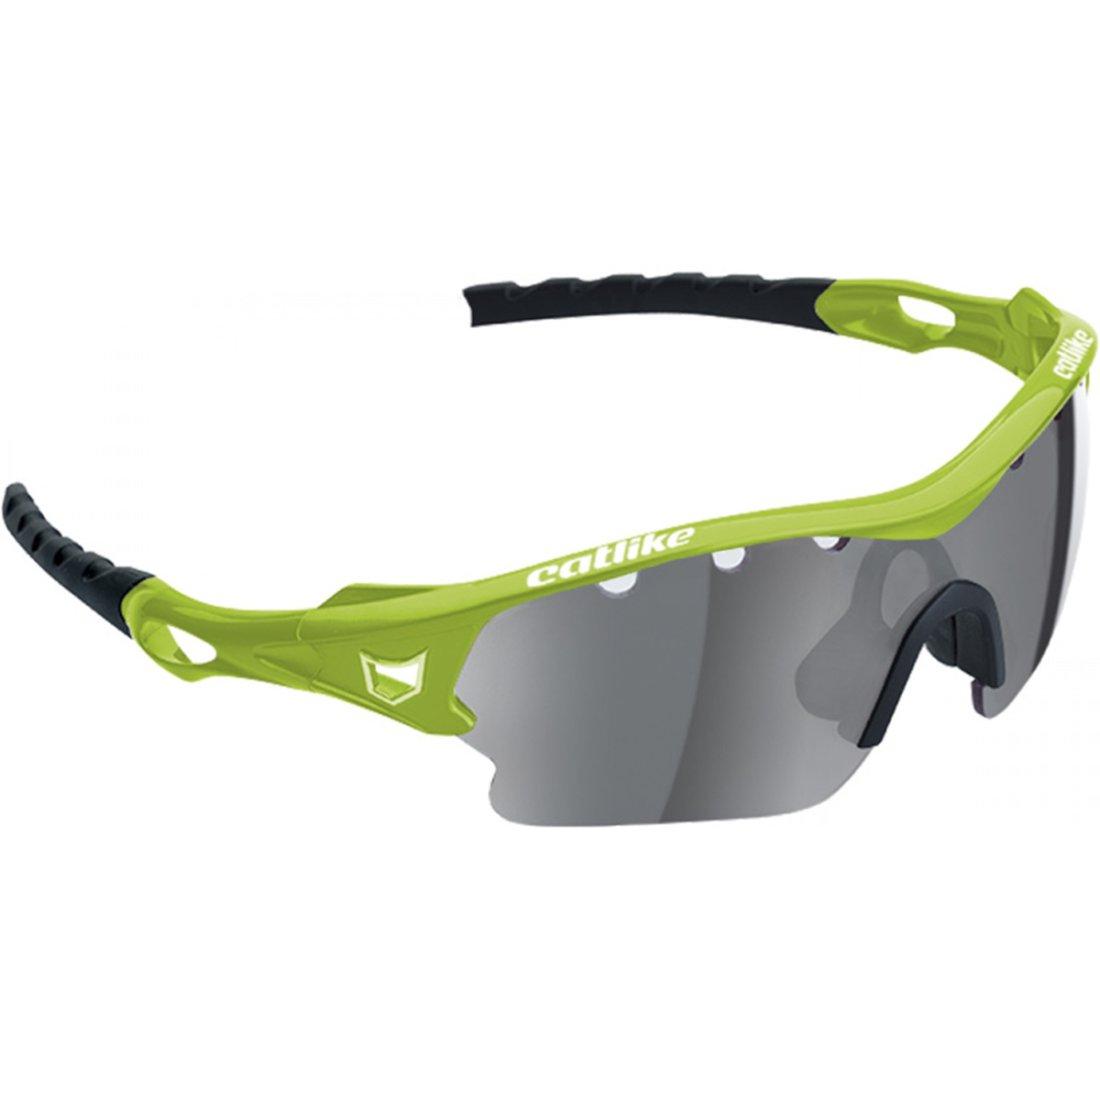 f76f733fdac CATLIKE Storm PH Green Mask   Goggle